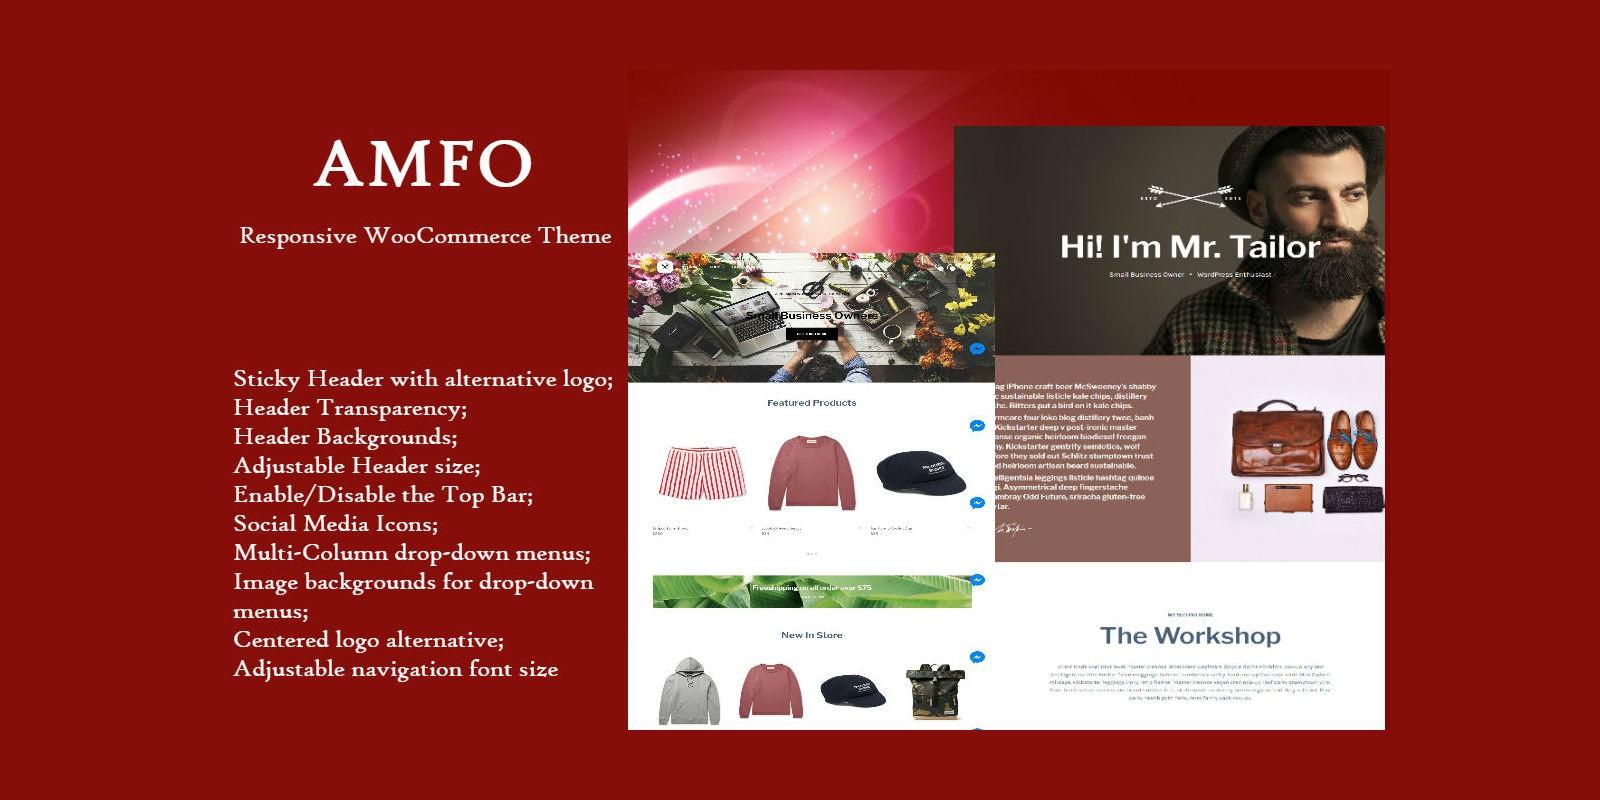 Amfo Responsive WooCommerce Theme